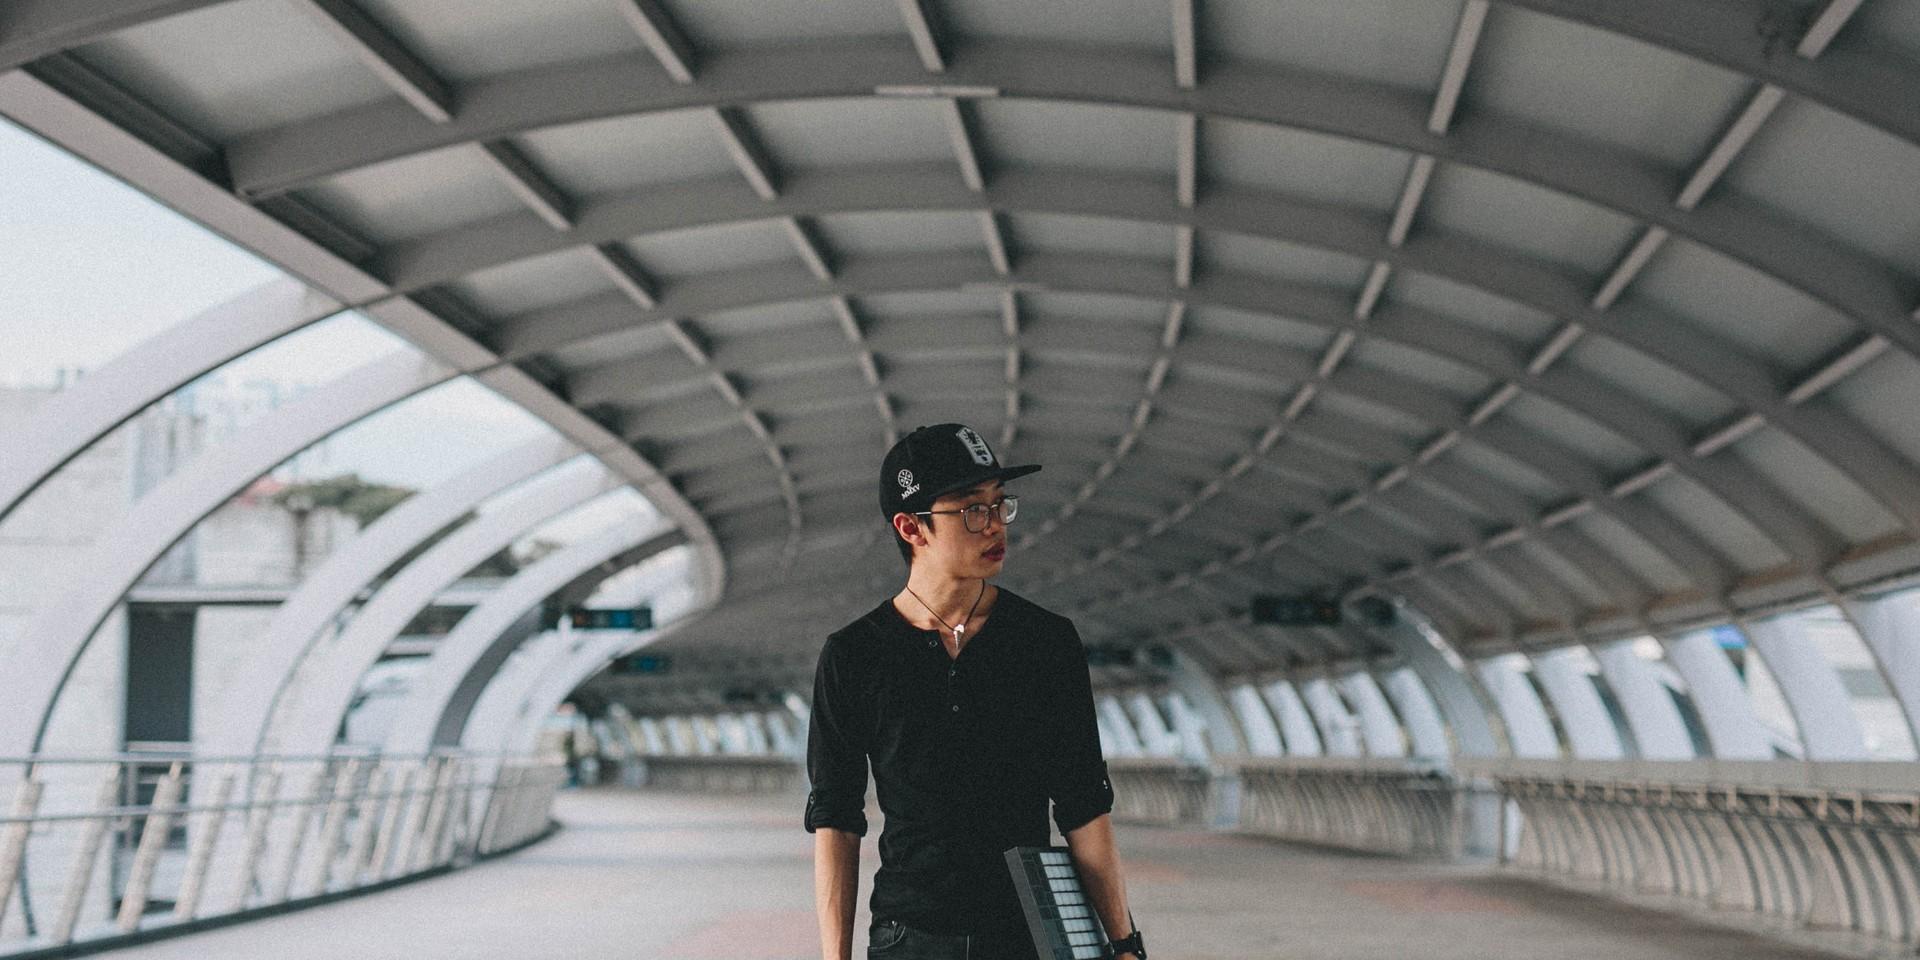 Evanturetime releases new single with Benjamin Kheng, Jon Chua, Nathan Hartono – listen